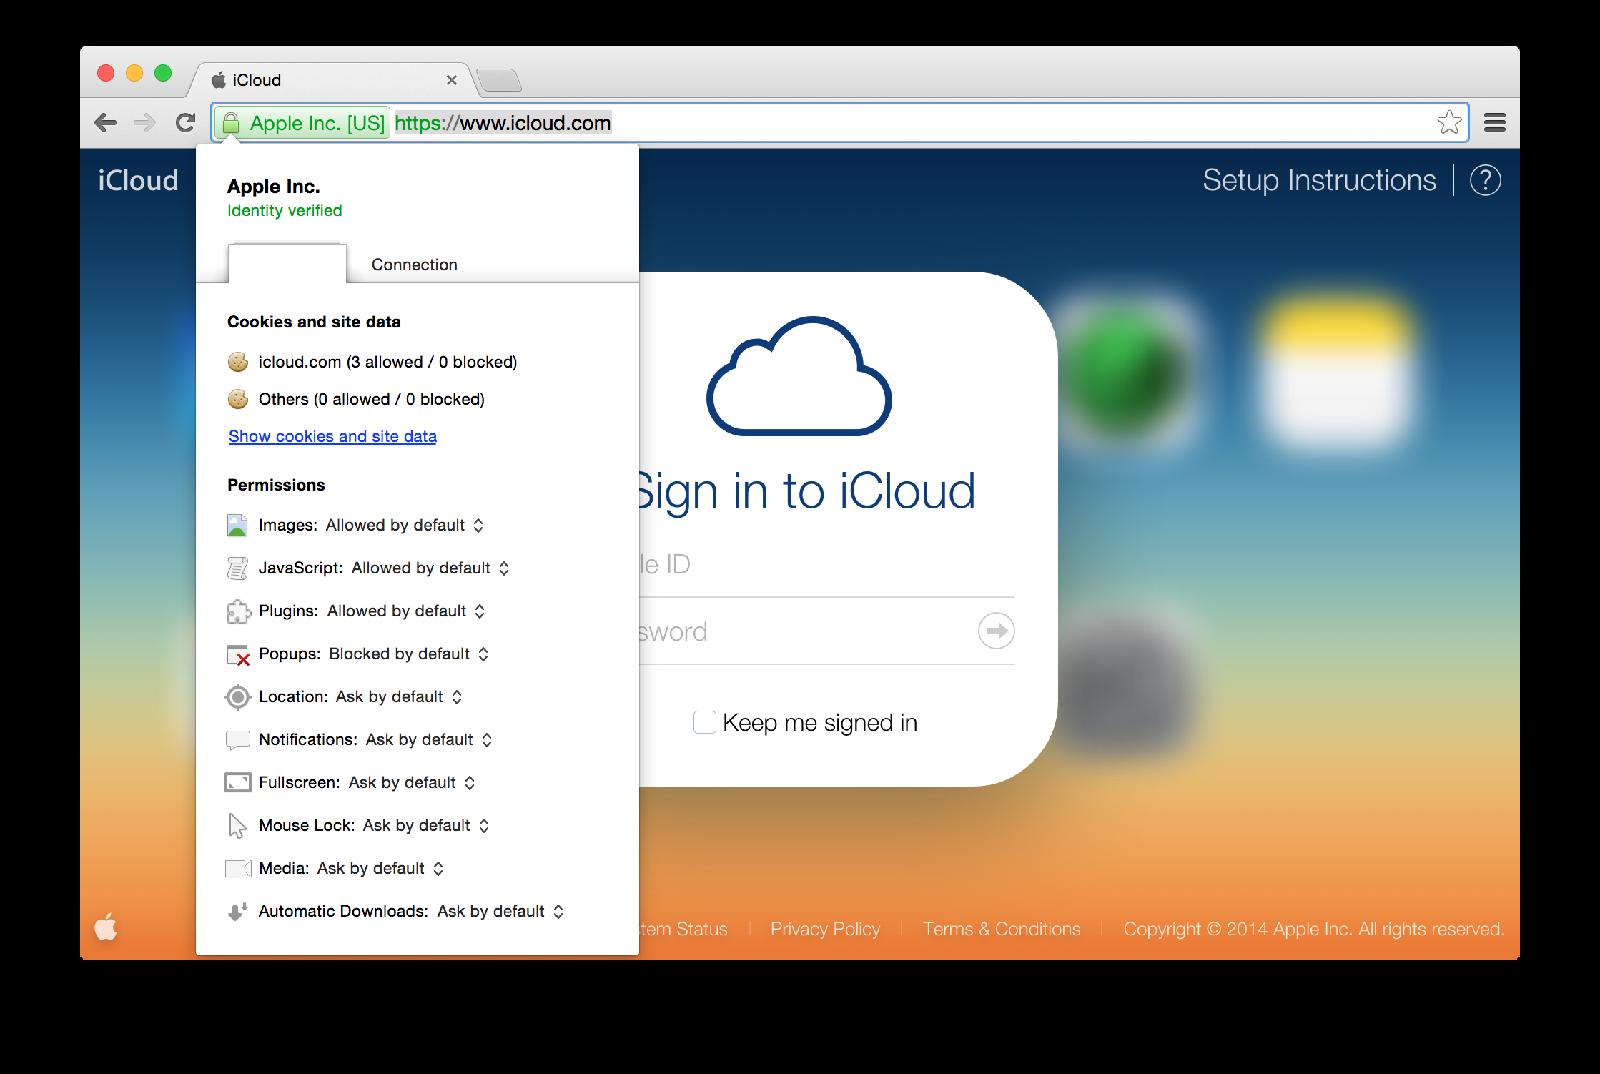 Chrome (iCloud login page verified)